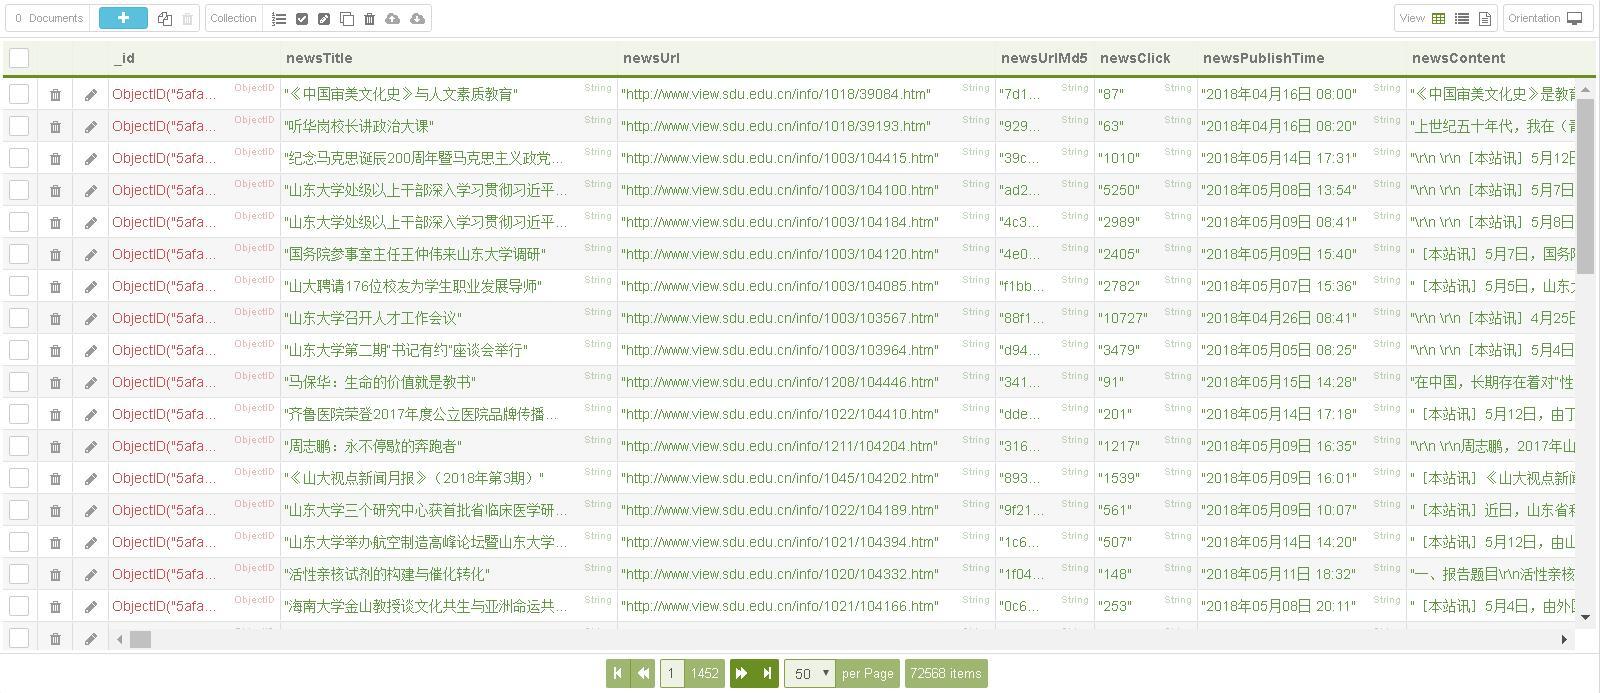 Mongo Management Studio 可视化工具显示.jpg